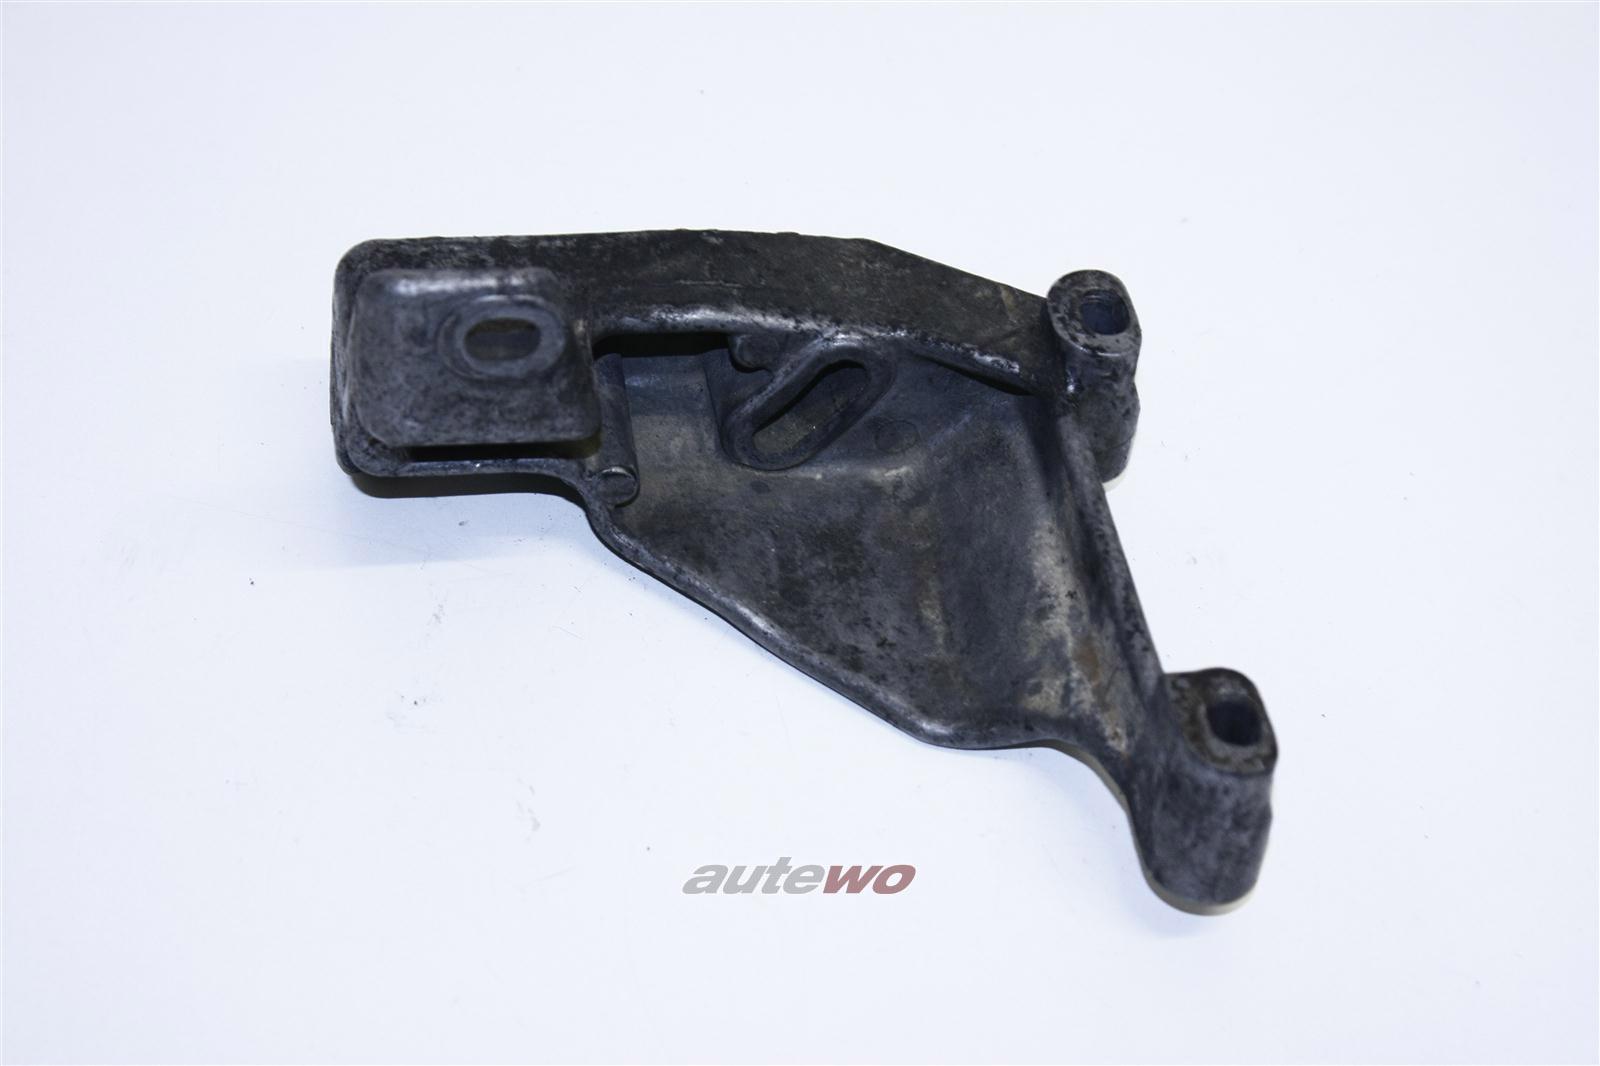 Audi 80 Typ 89/B4 1.6-2.0l 4 Zylinder Halter Servopumpe 050145531 026145531D